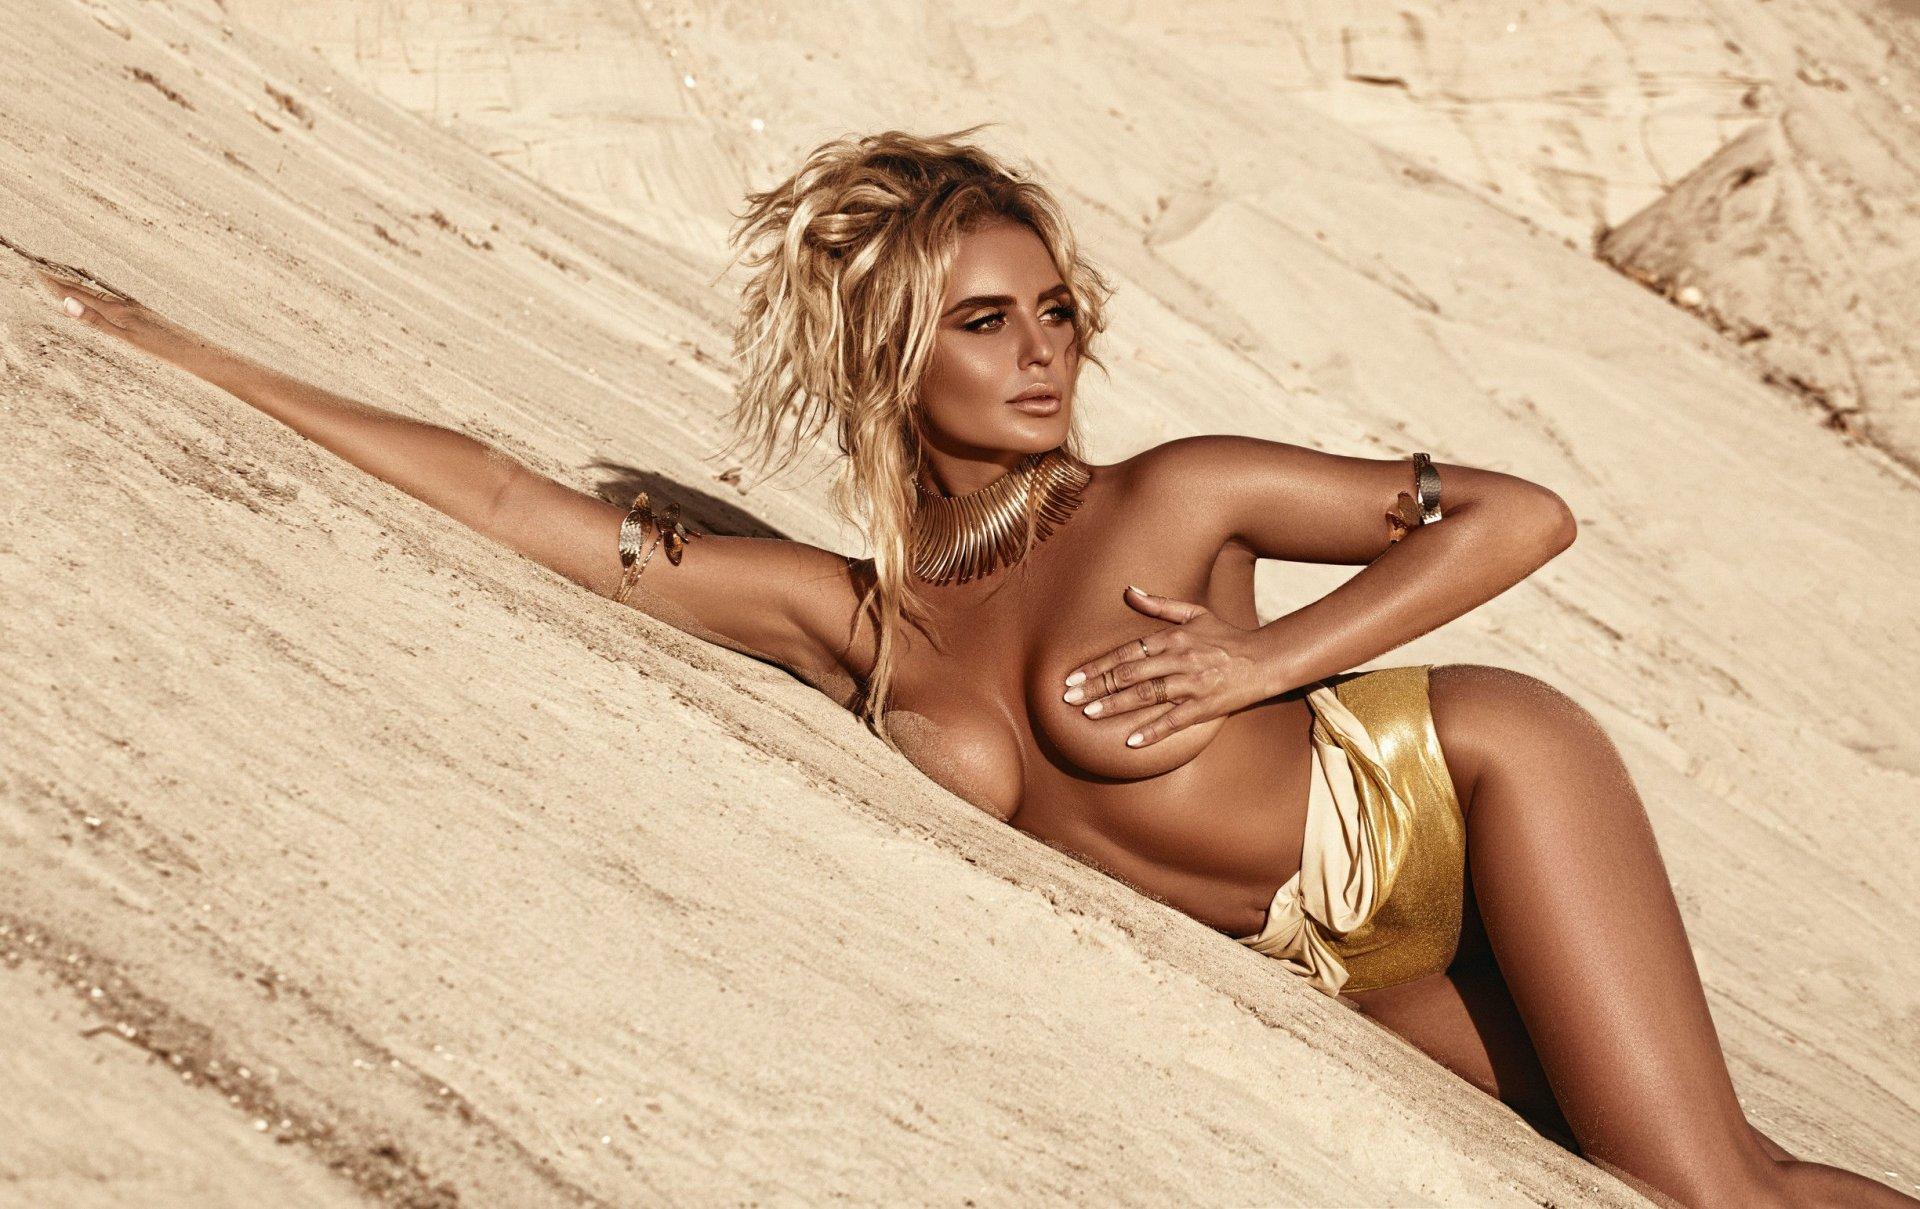 Ass Alena Podloznaya naked (79 foto and video), Sexy, Paparazzi, Selfie, lingerie 2019